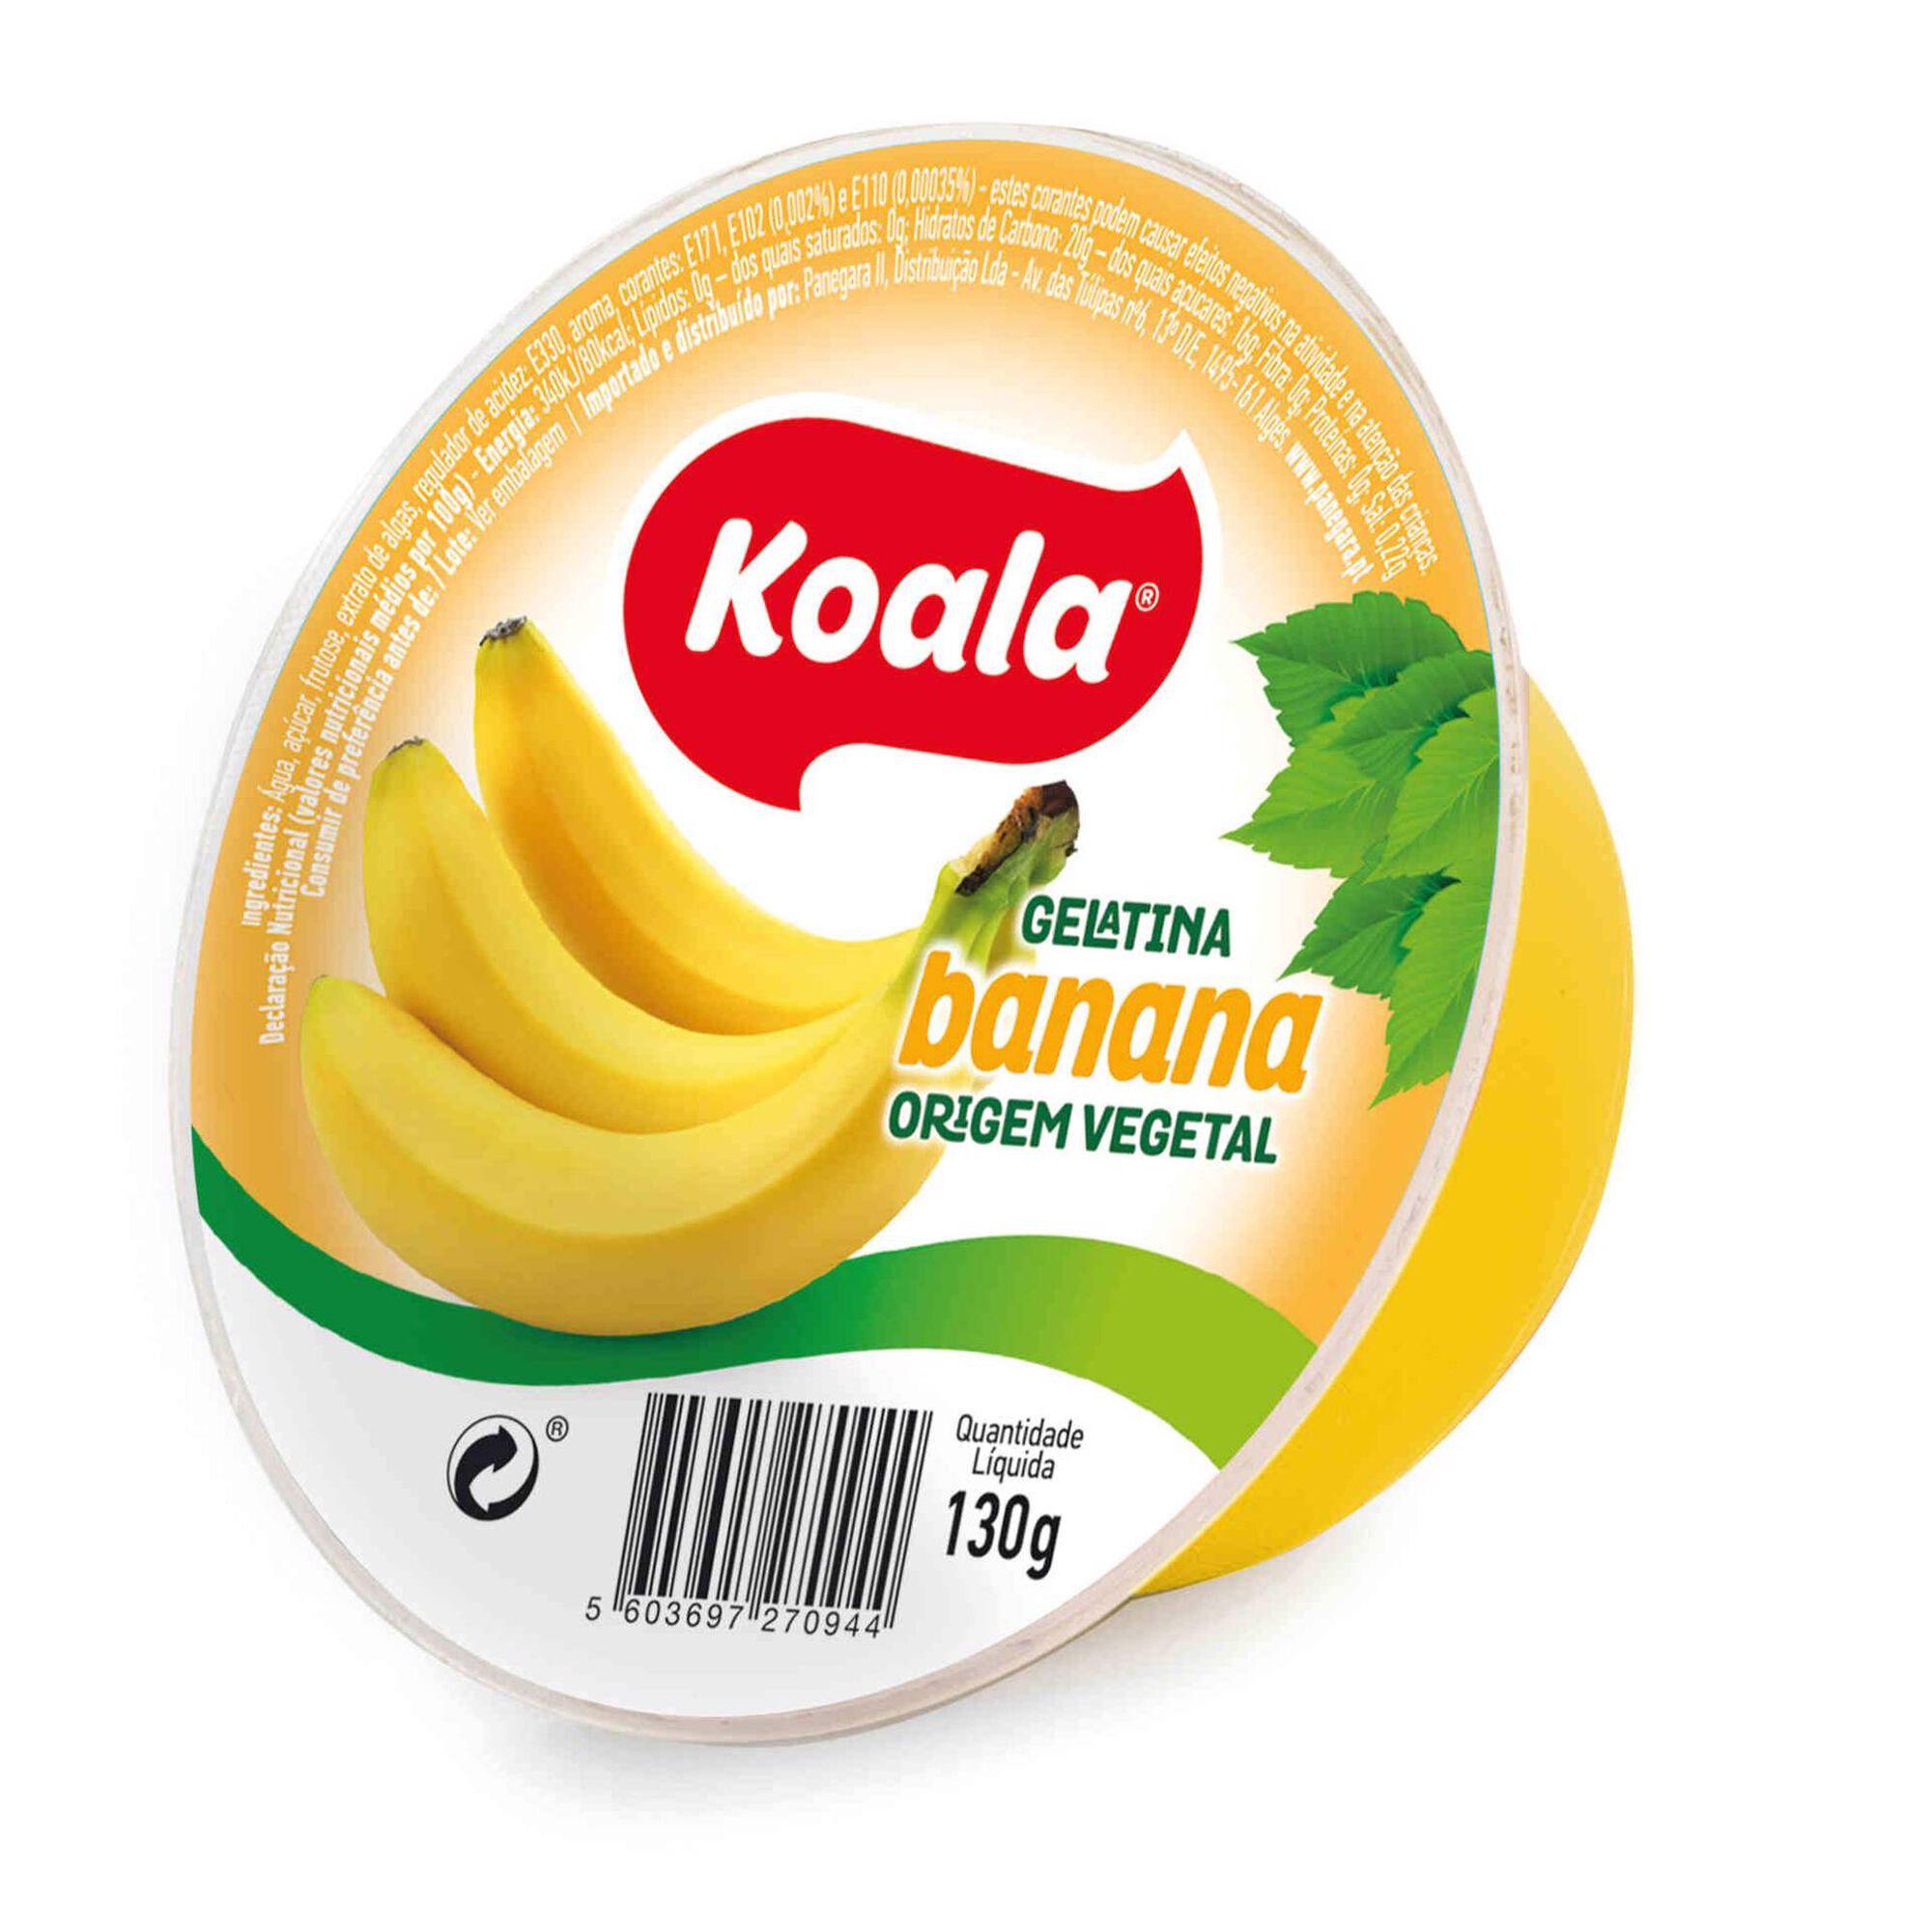 Gelatina Pronta de Banana